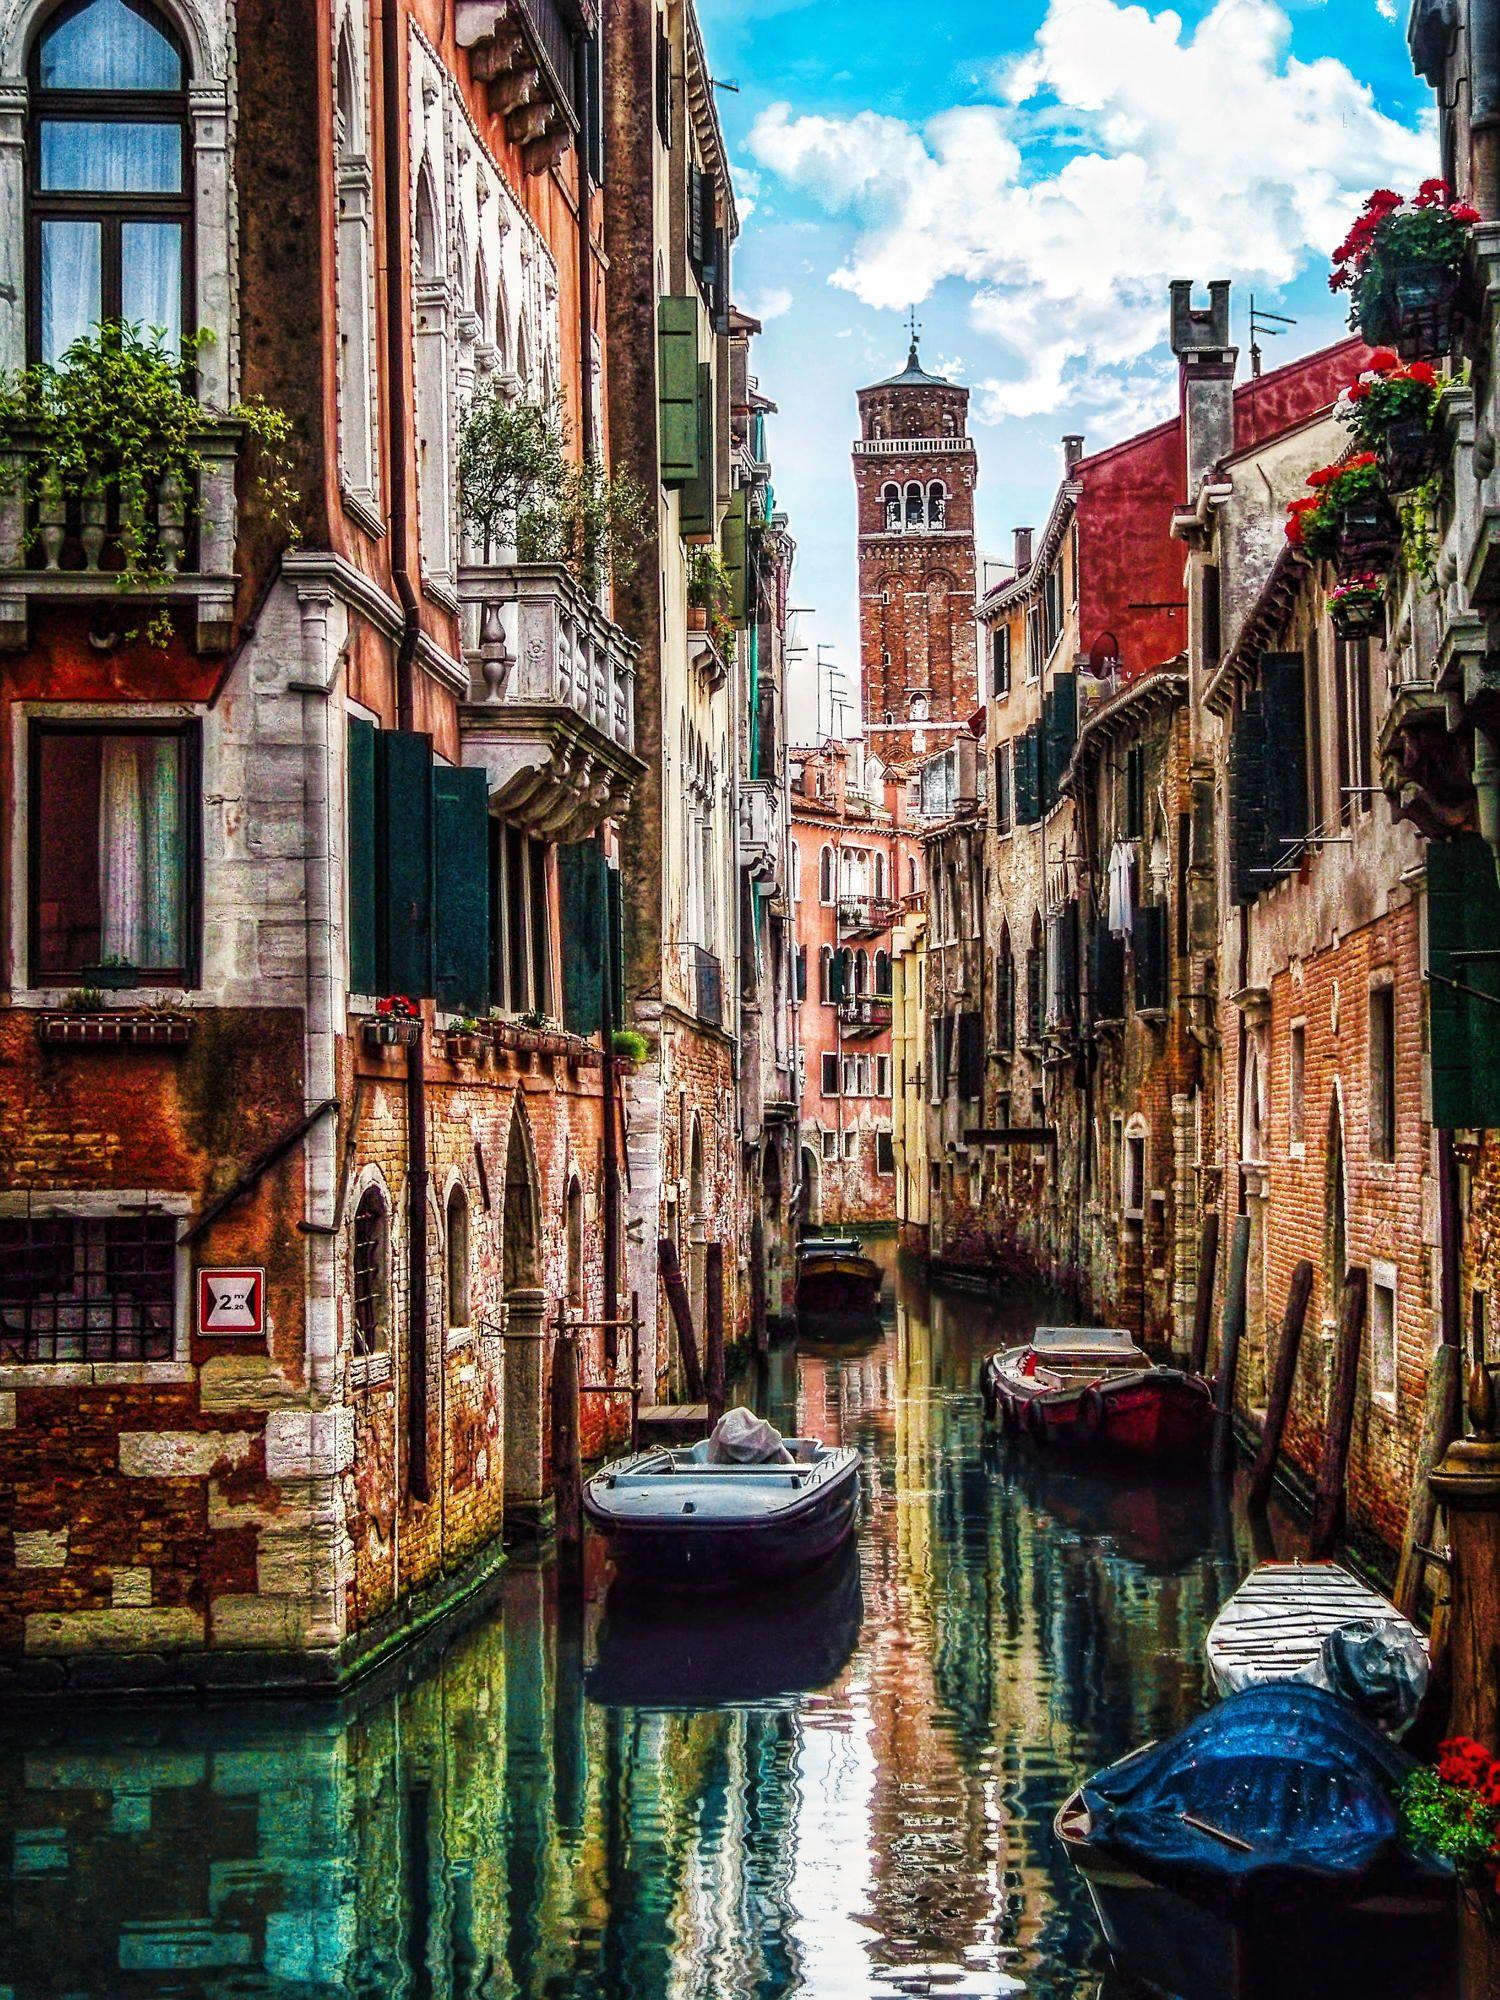 Venice by Andrea Conti on 500px